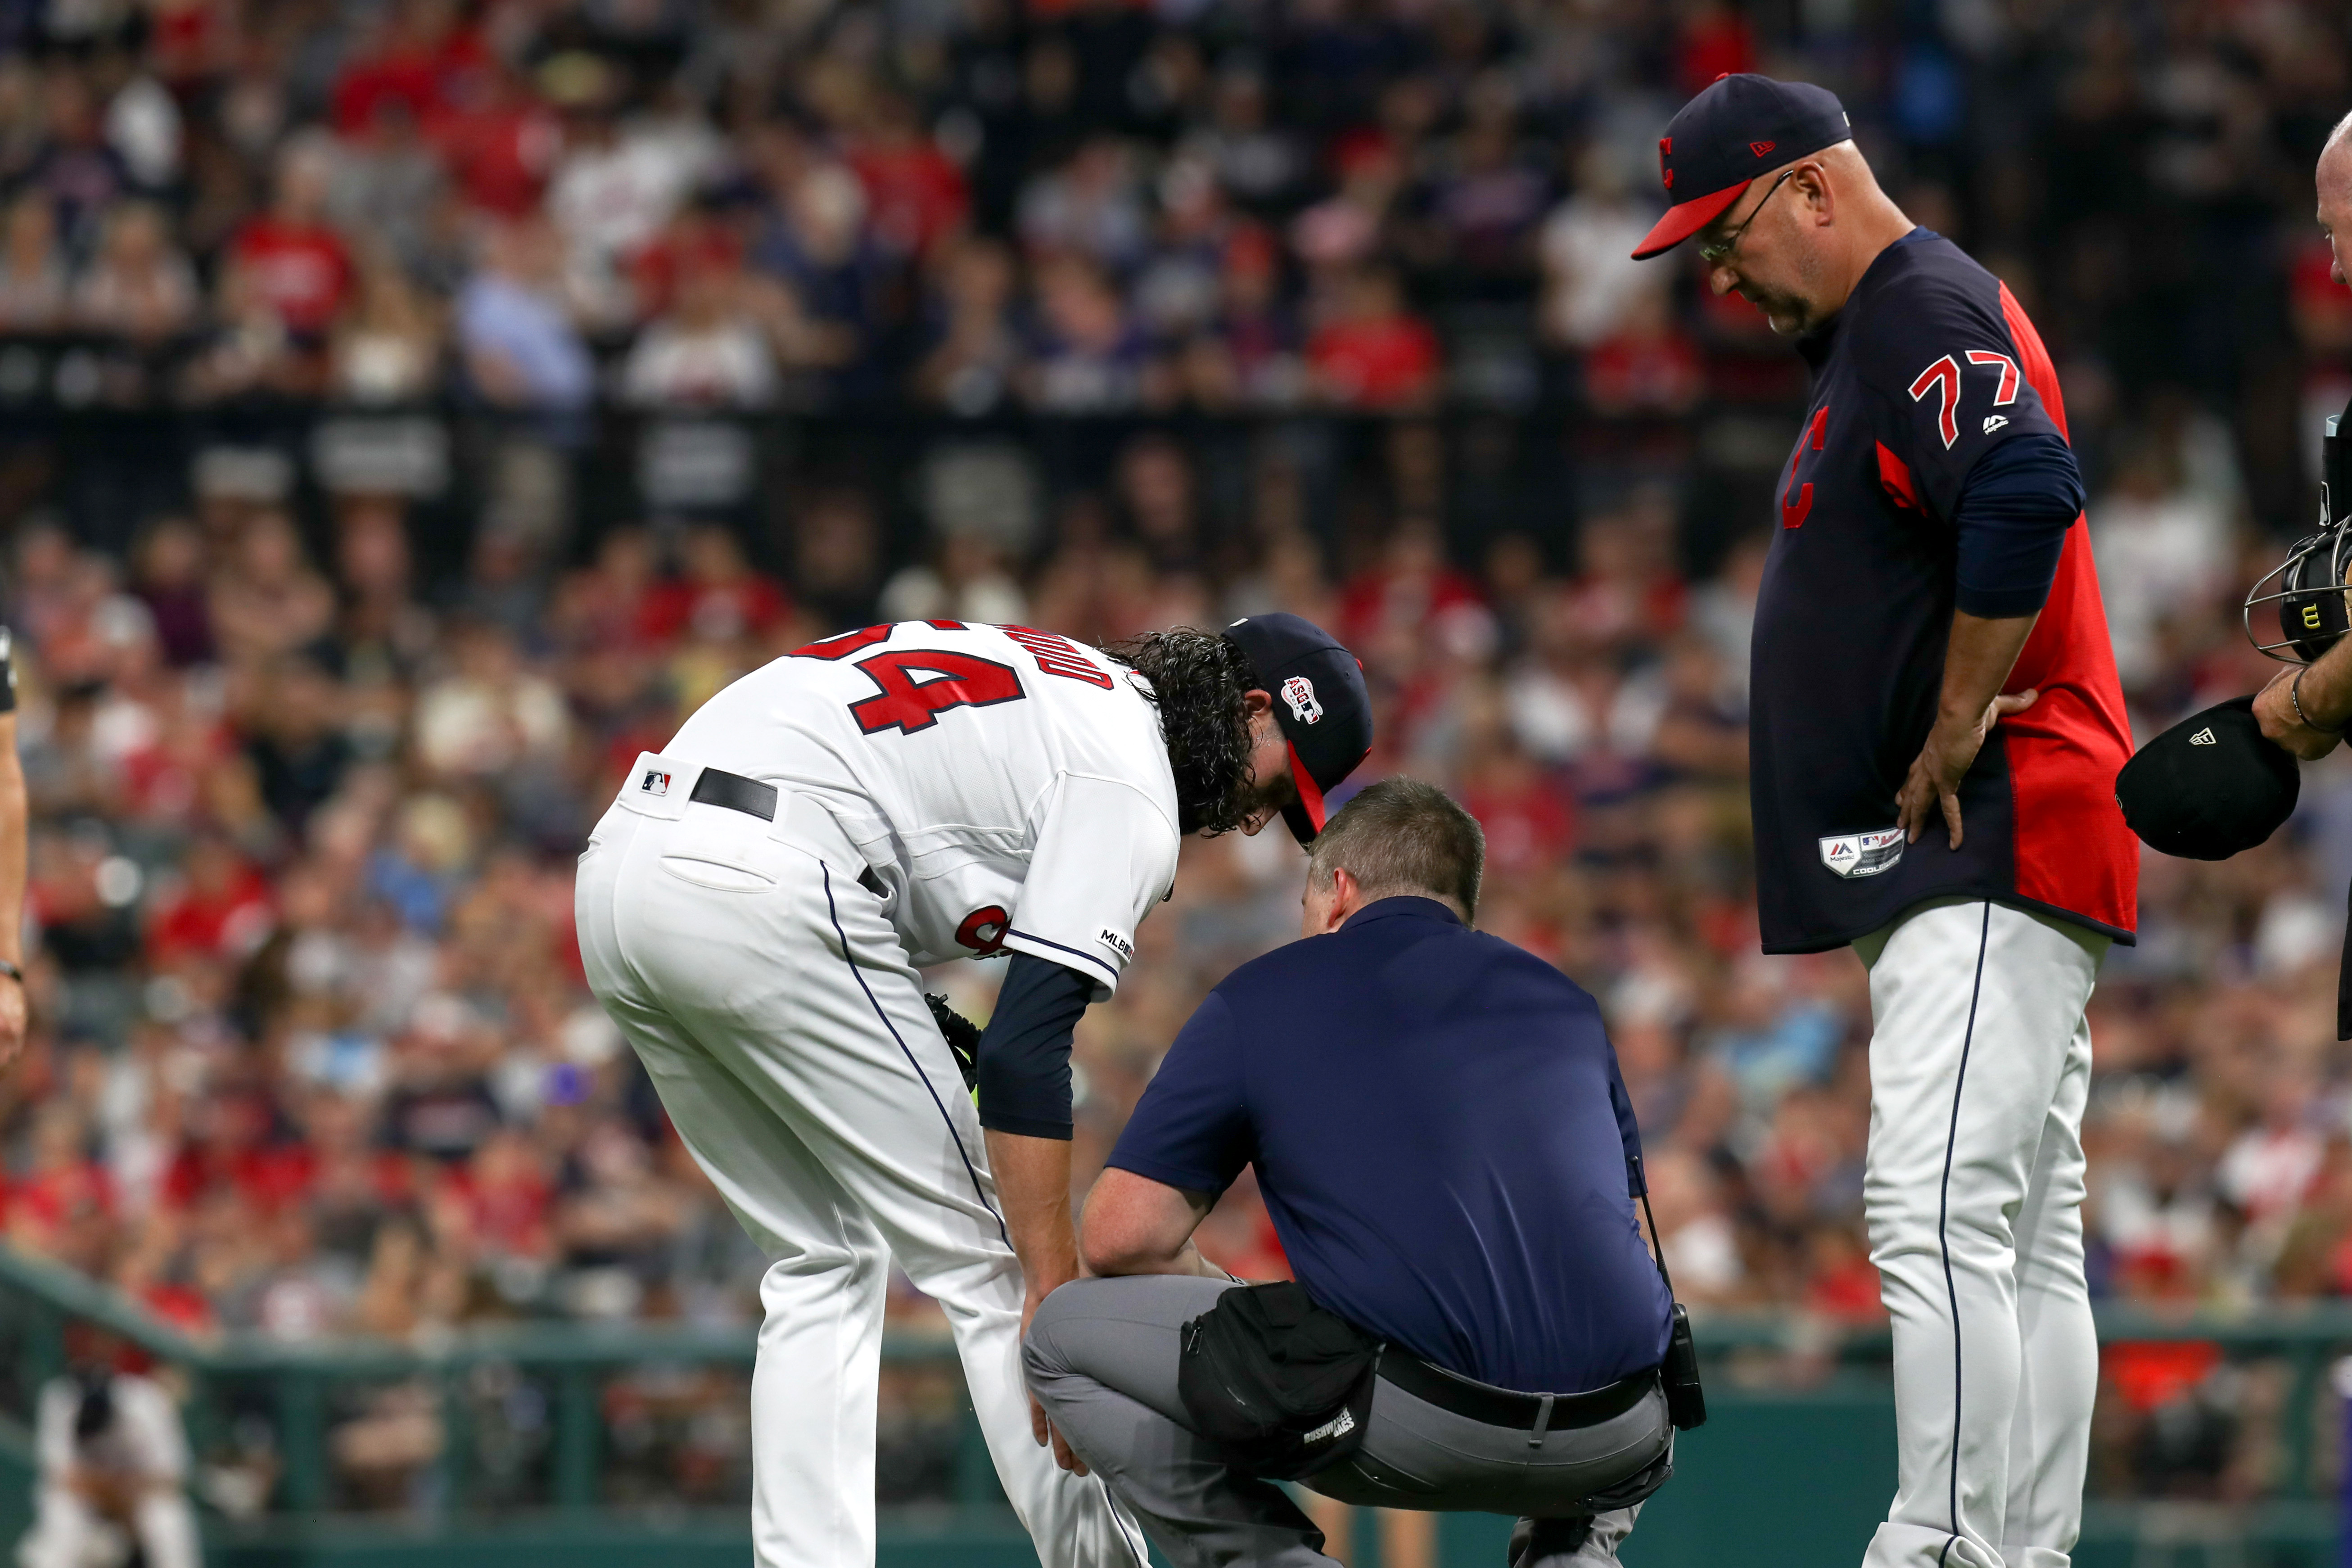 MLB: AUG 12 Red Sox at Indians